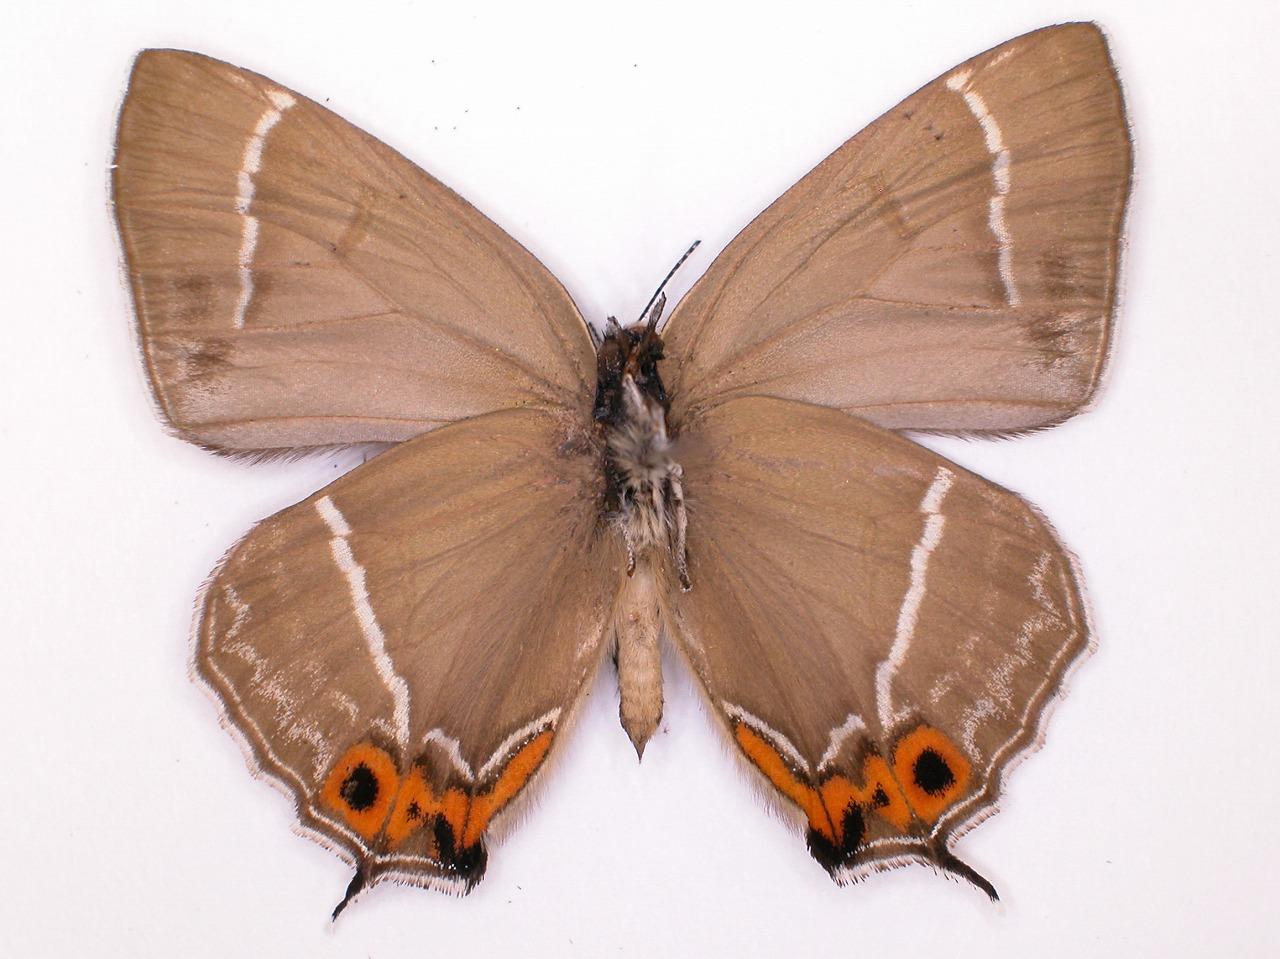 https://www.hitohaku.jp/material/l-material/butterfly-wing/5-lycaenidae/B1-637539_B.jpg